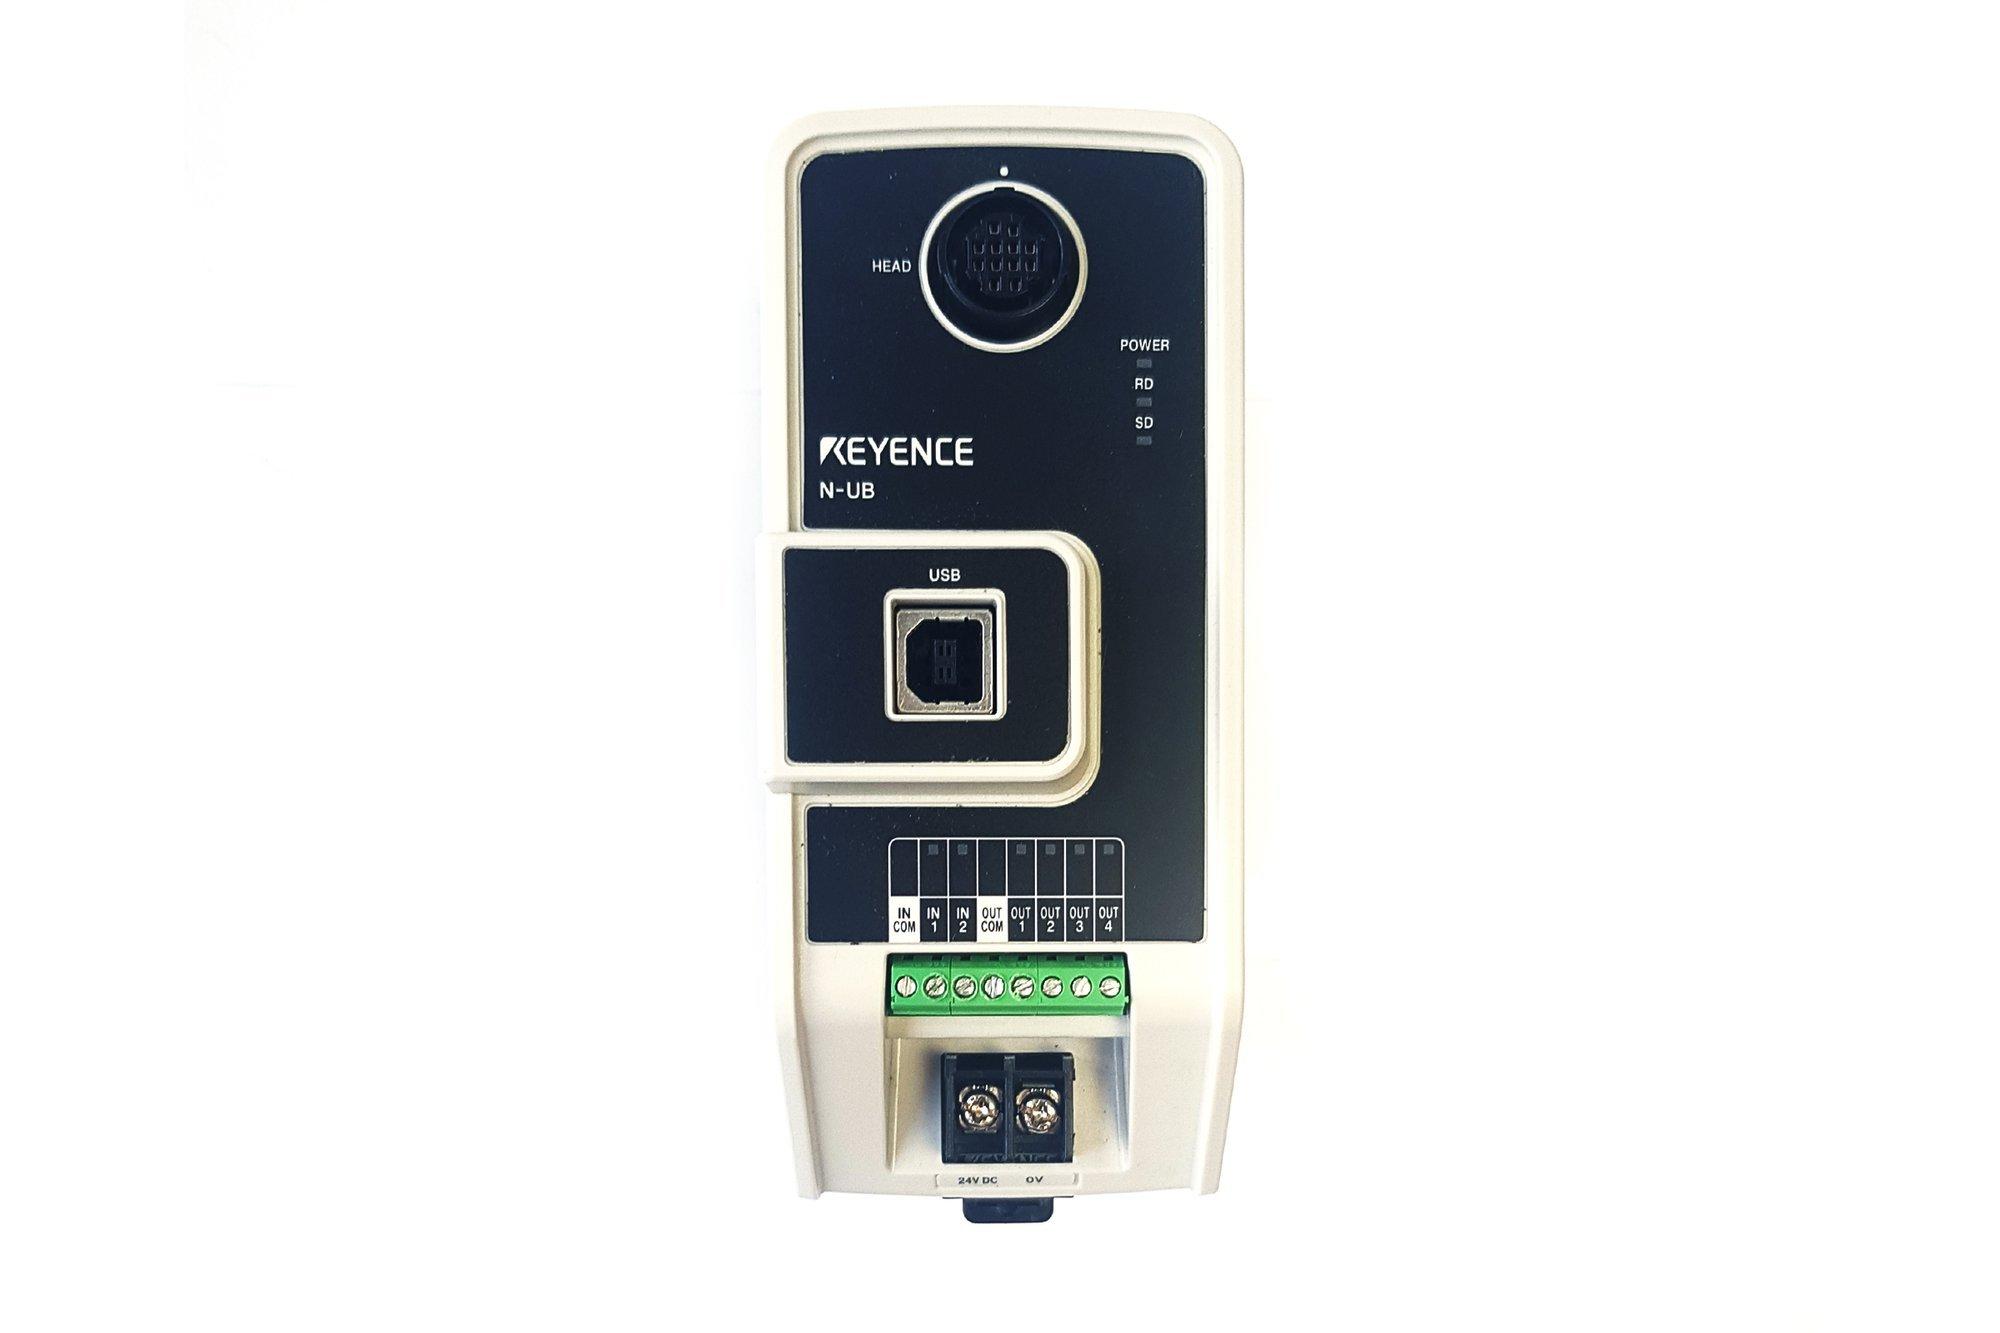 Keyence Dedicated Communication Unit USB Type N-UB